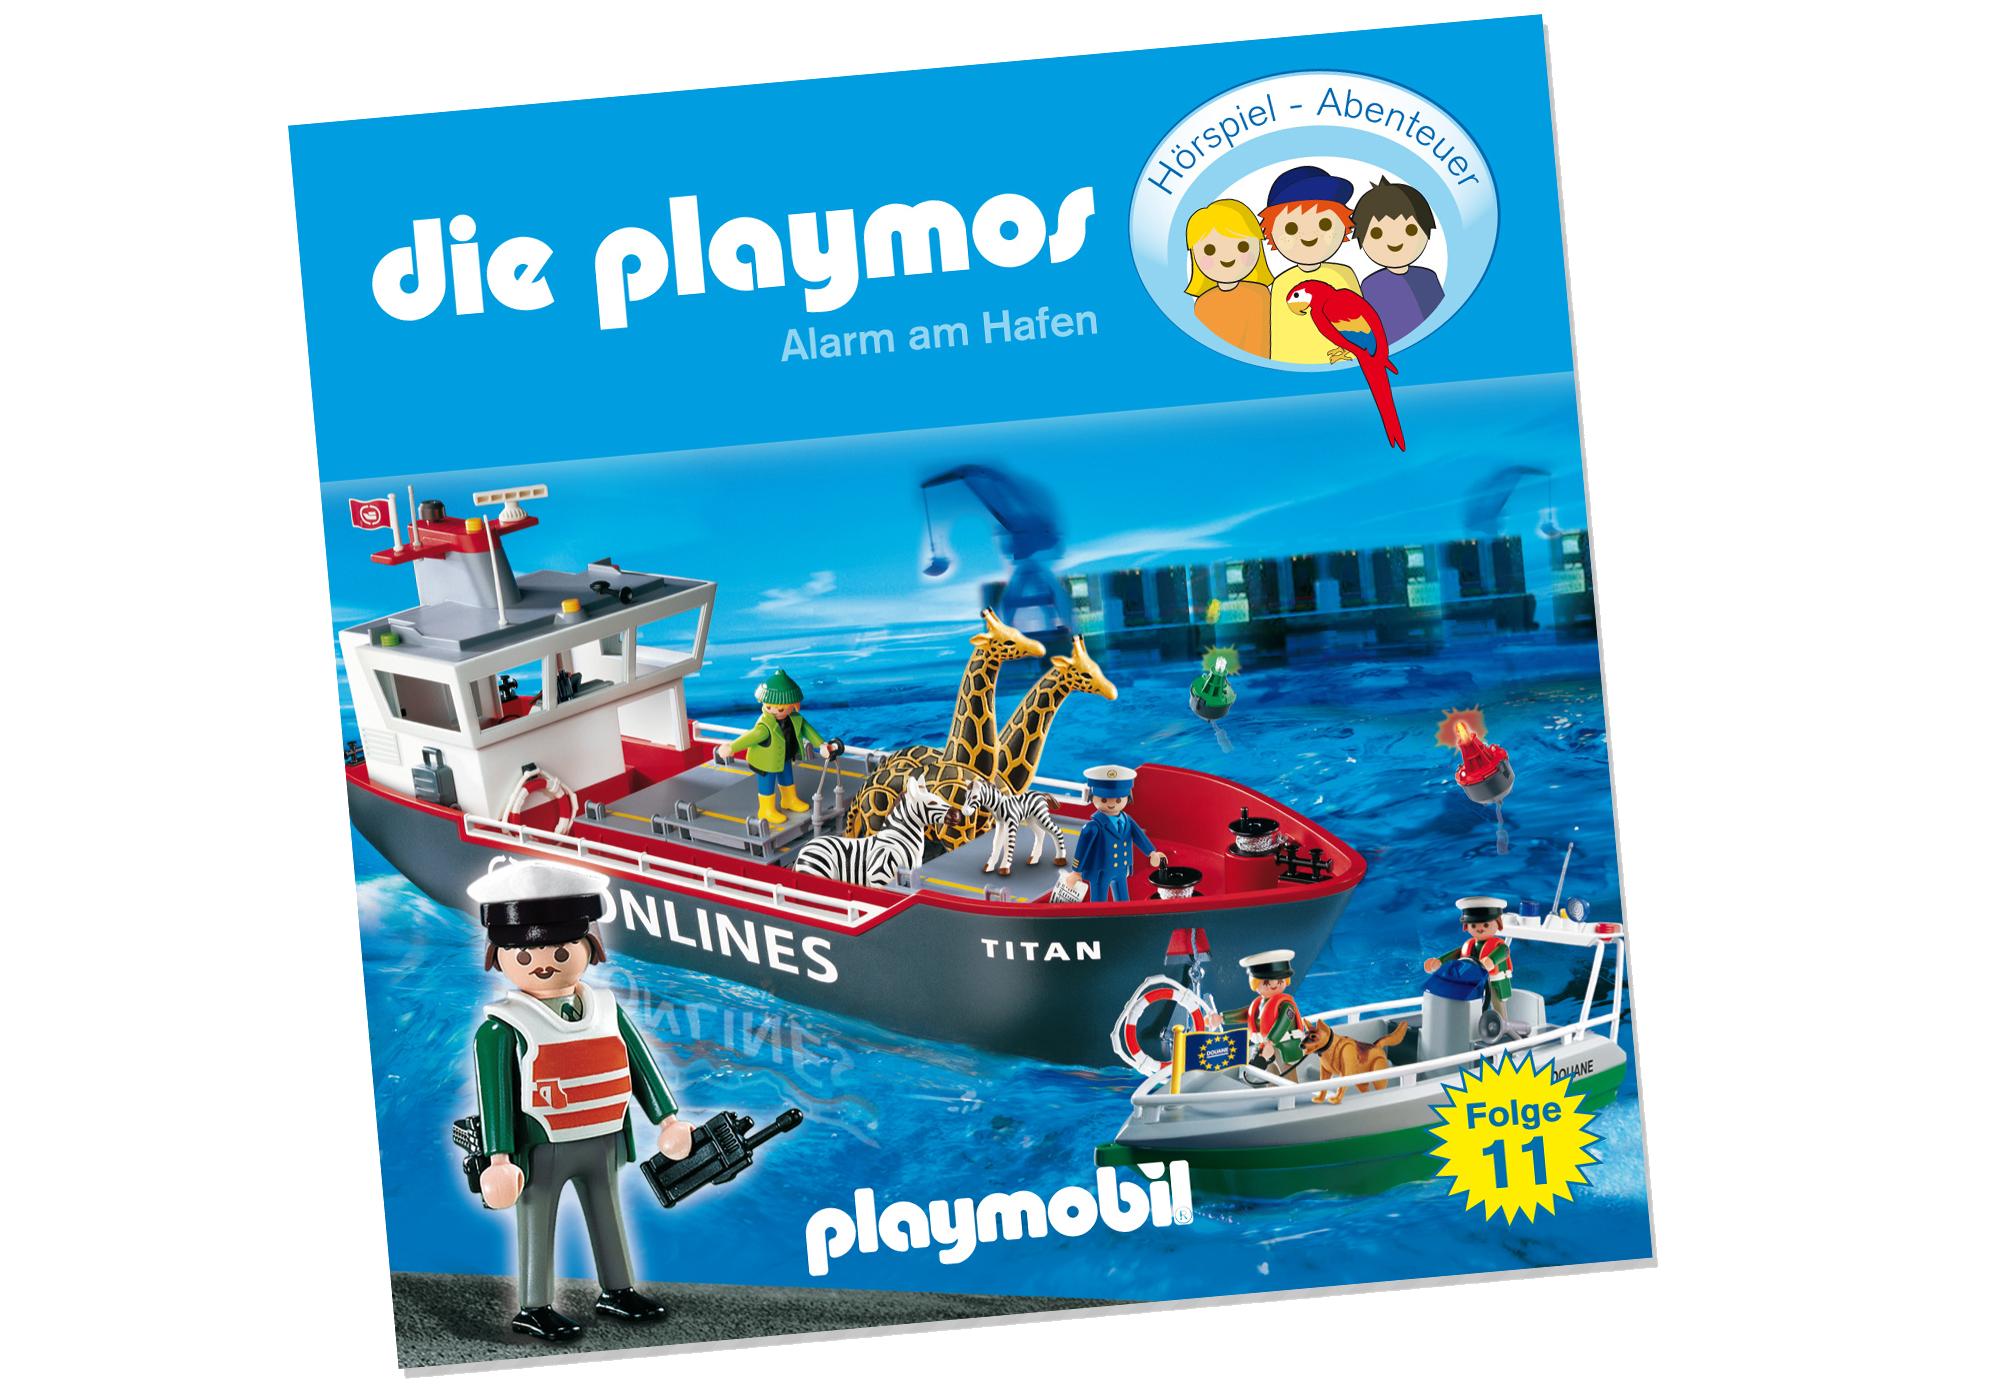 http://media.playmobil.com/i/playmobil/80198_product_detail